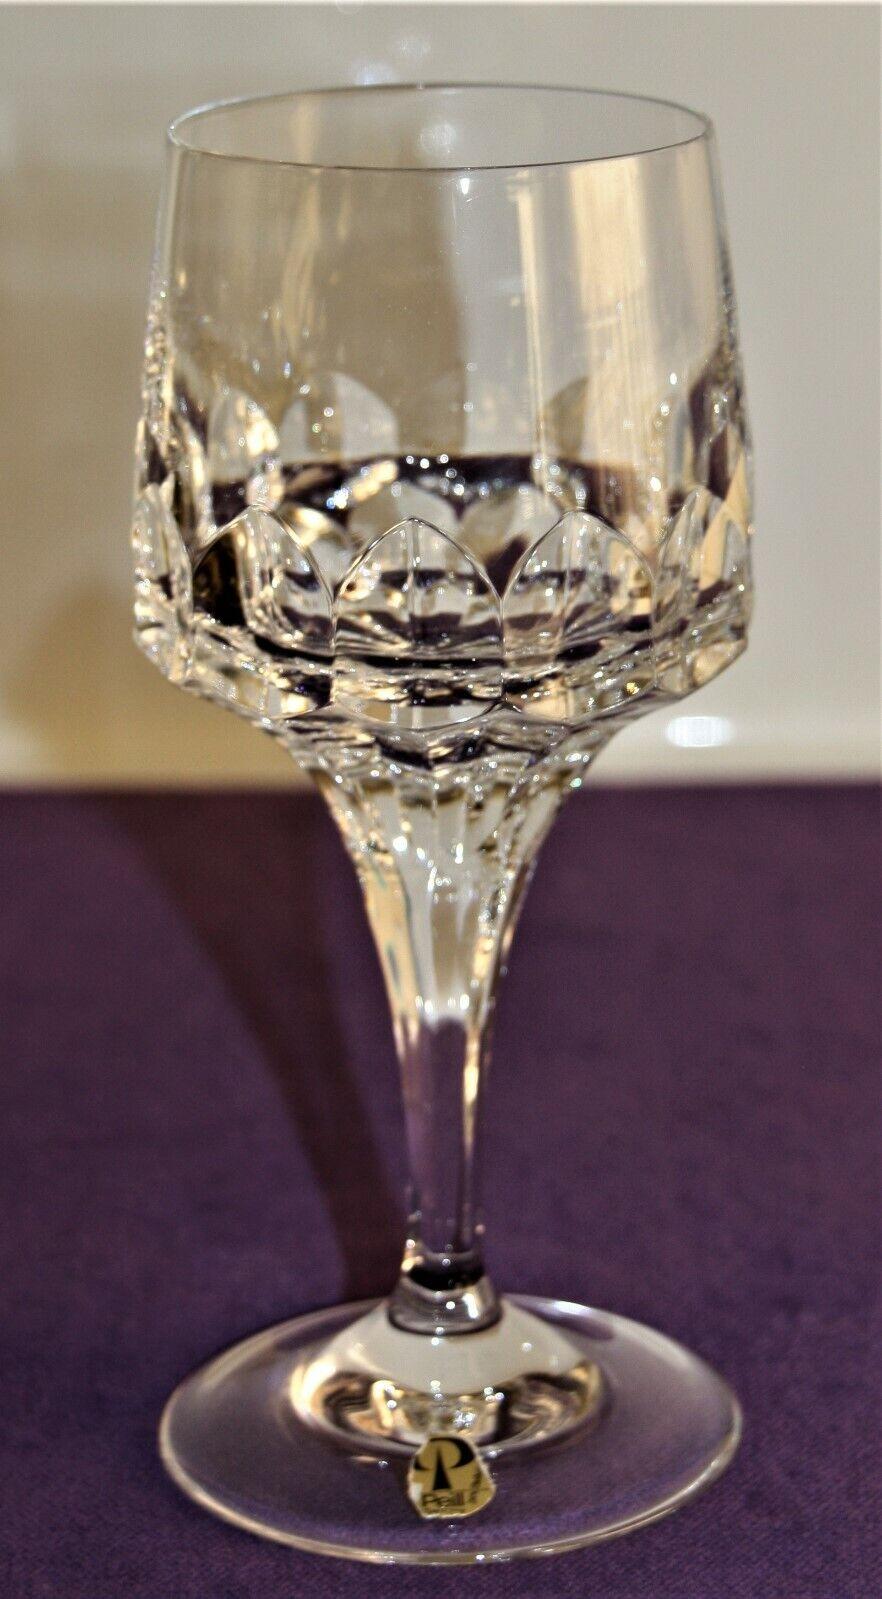 Peill & putzler minerva verre de vin blanc - verre de vin h env. 16 cm